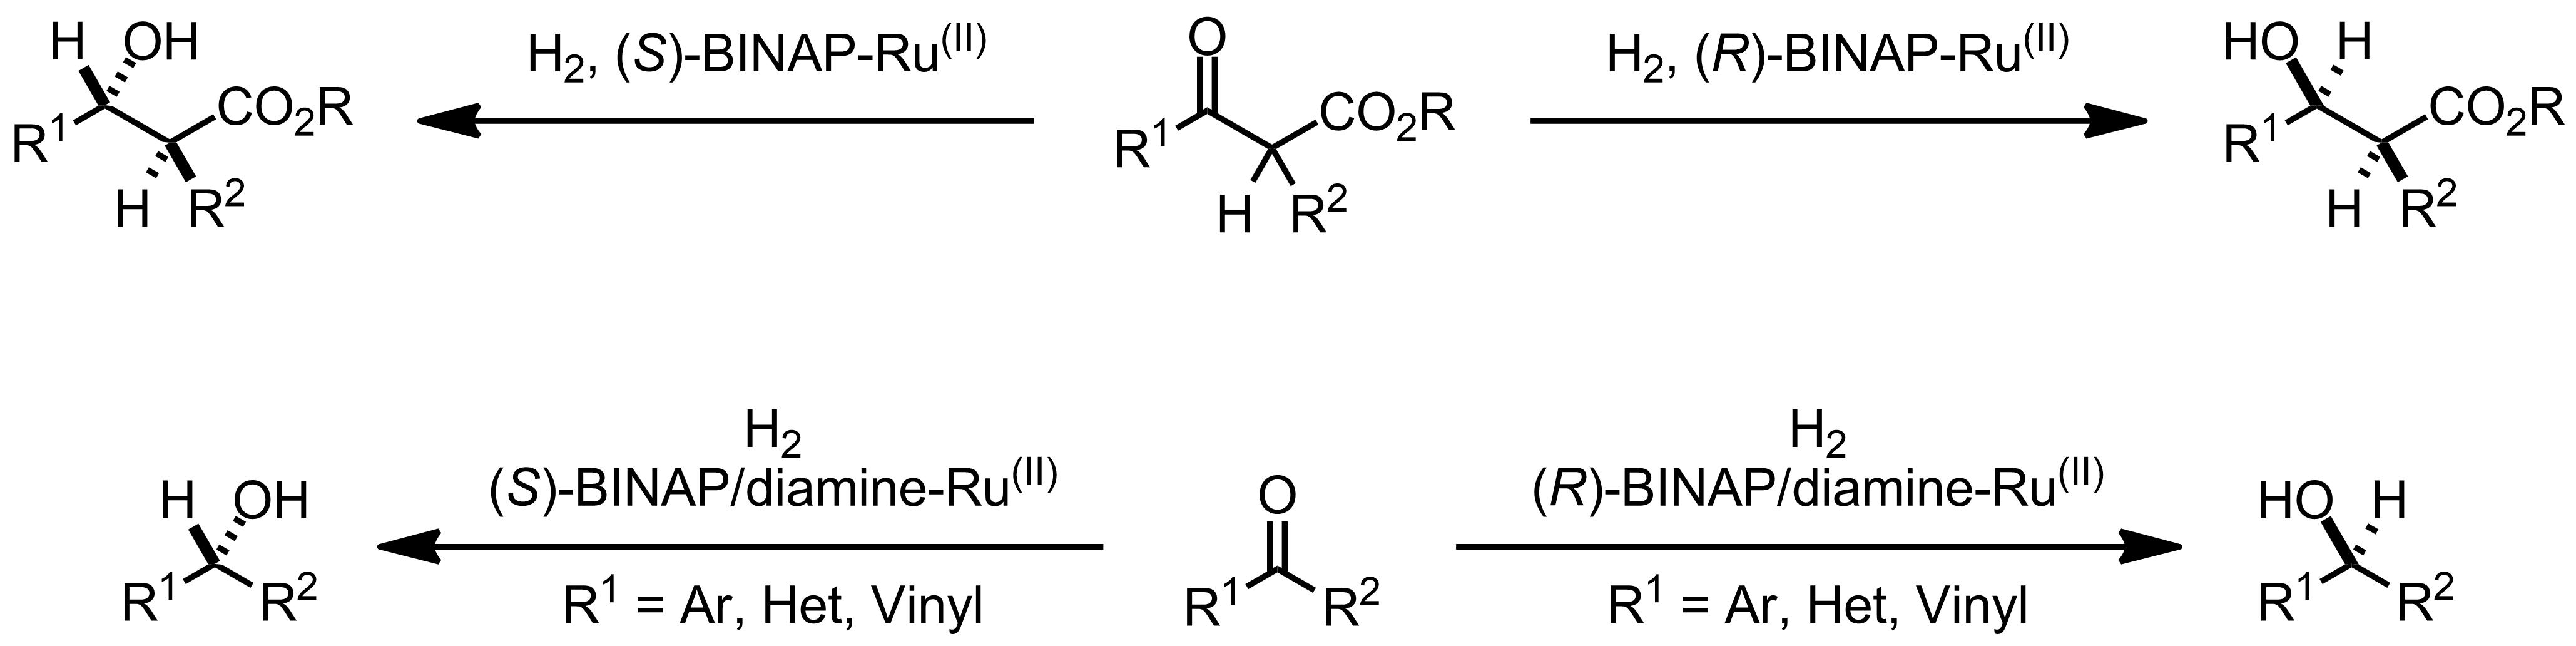 Schematic representation of the Noyori Asymmetric Hydrogenation.